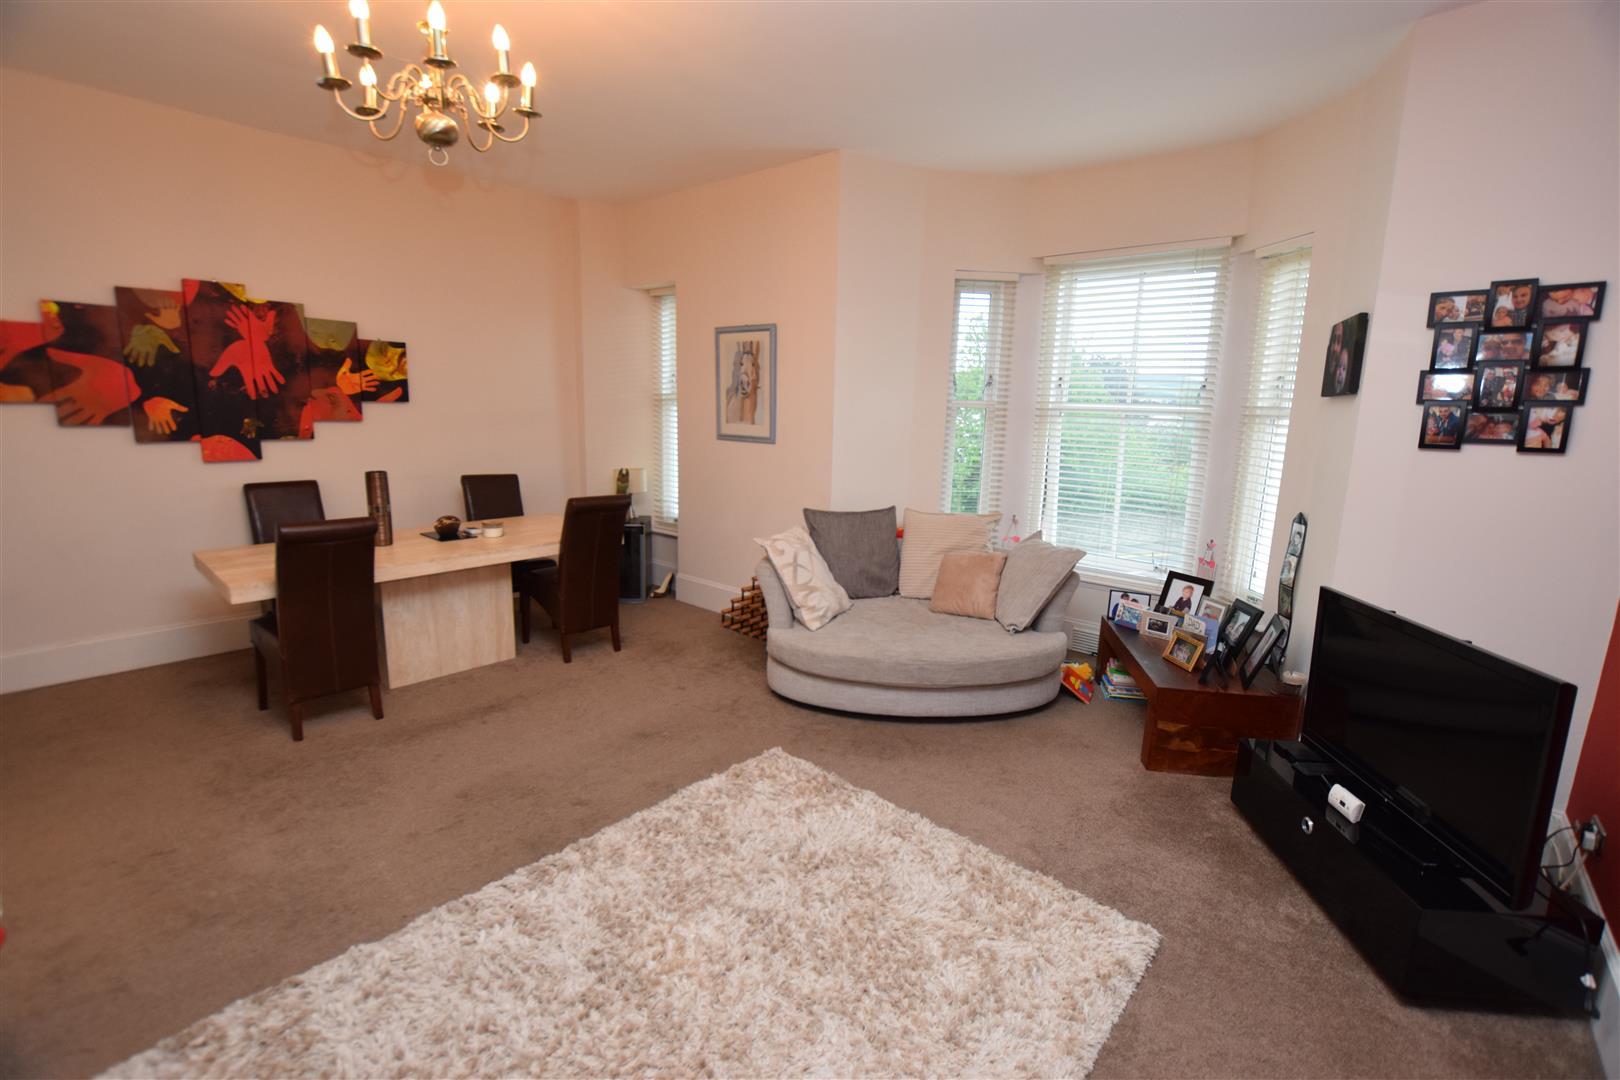 Flat 1, 3, Queen Street, Perth, Perthshire, PH2 0EQ, UK